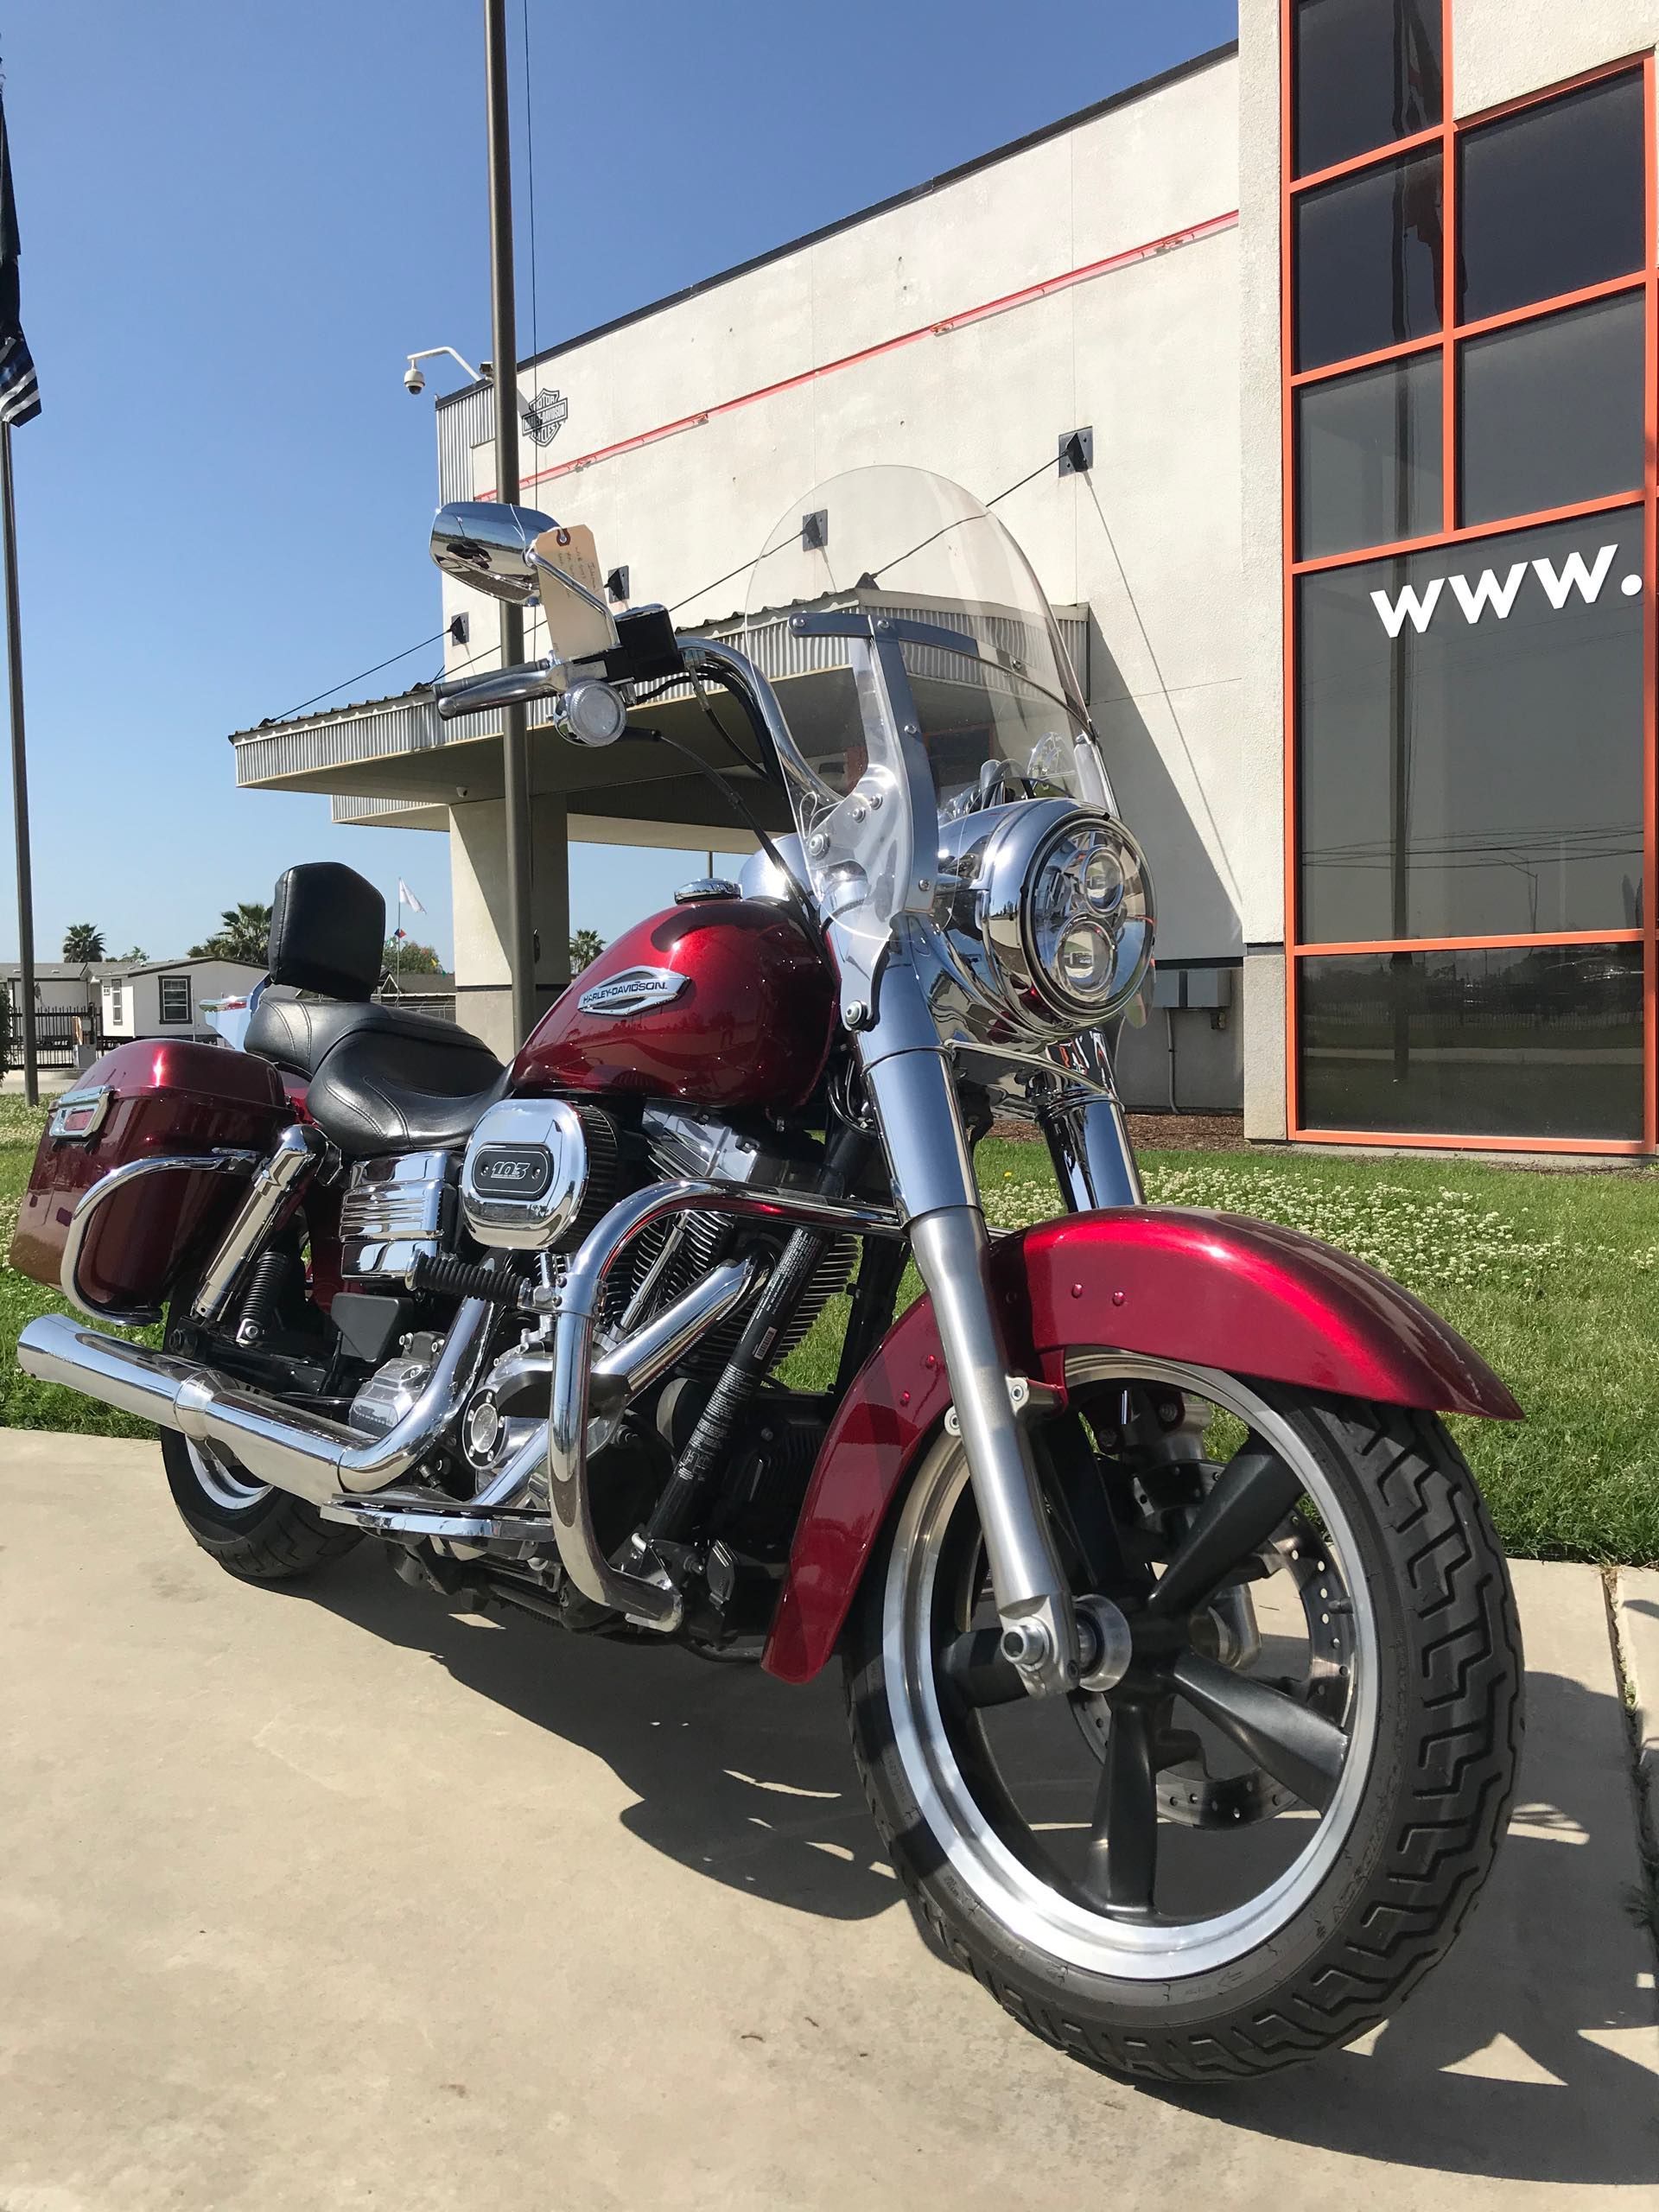 2016 Harley-Davidson Dyna Switchback at Visalia Harley-Davidson